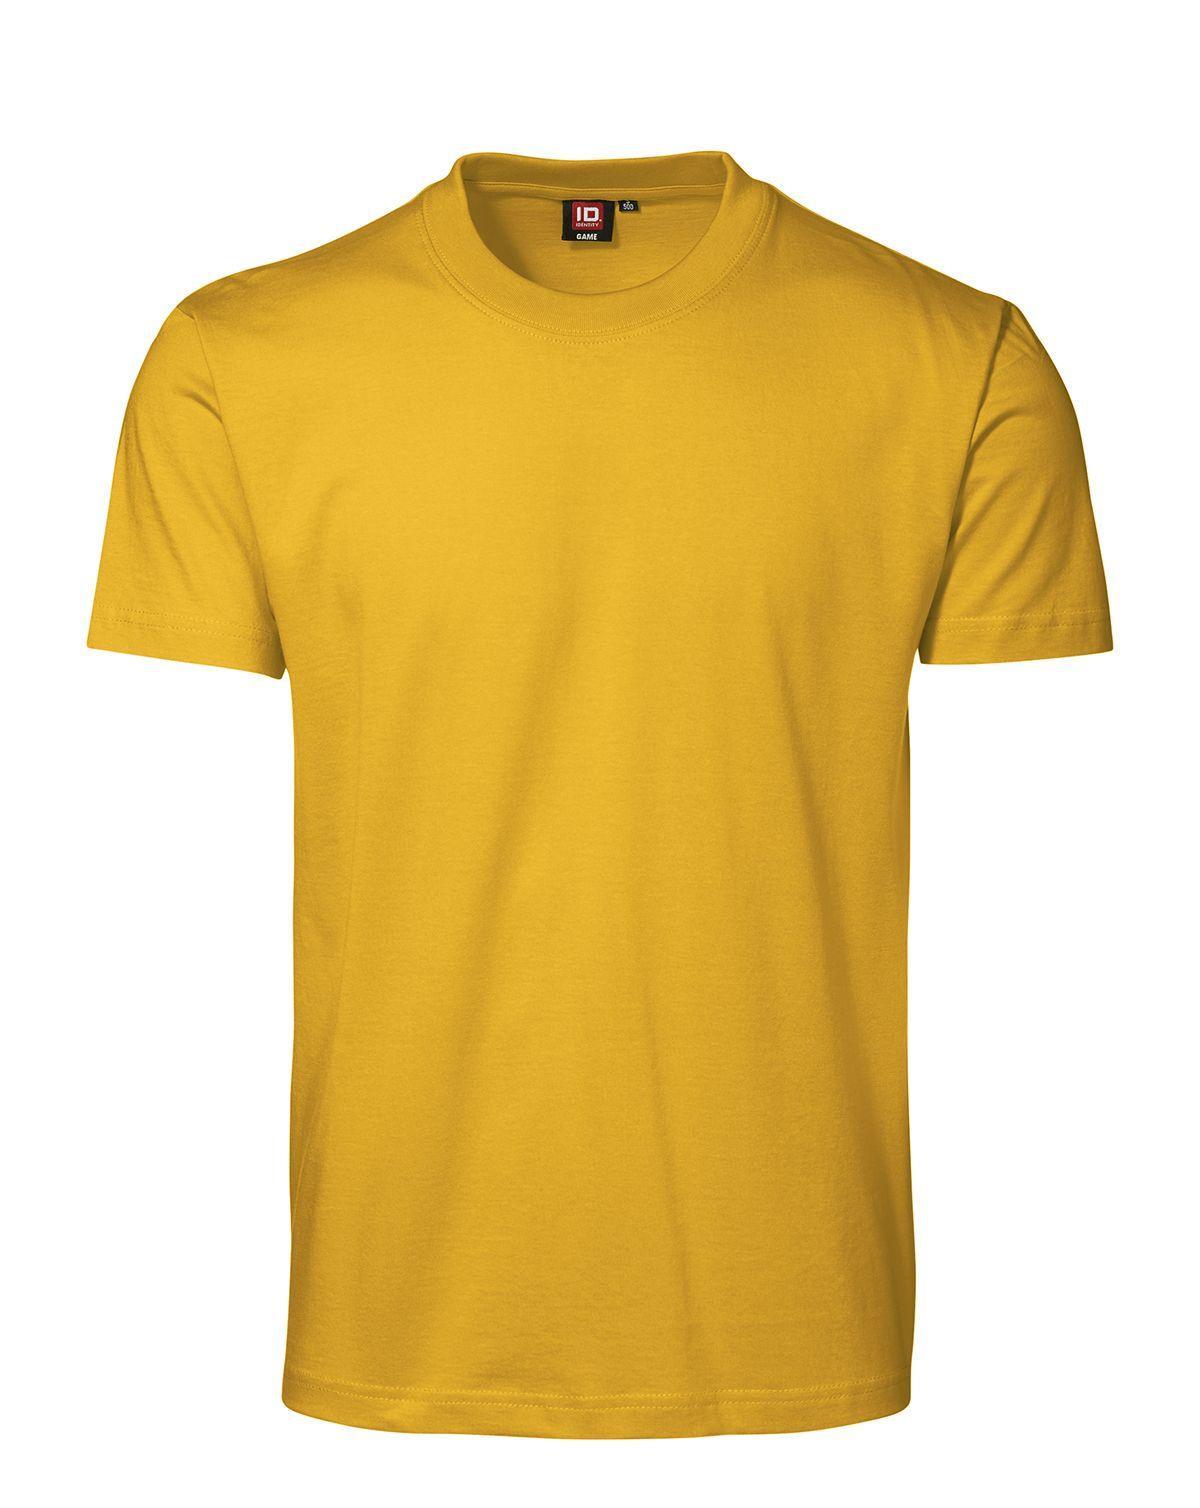 ID GAME T-shirt (Gul, XL)